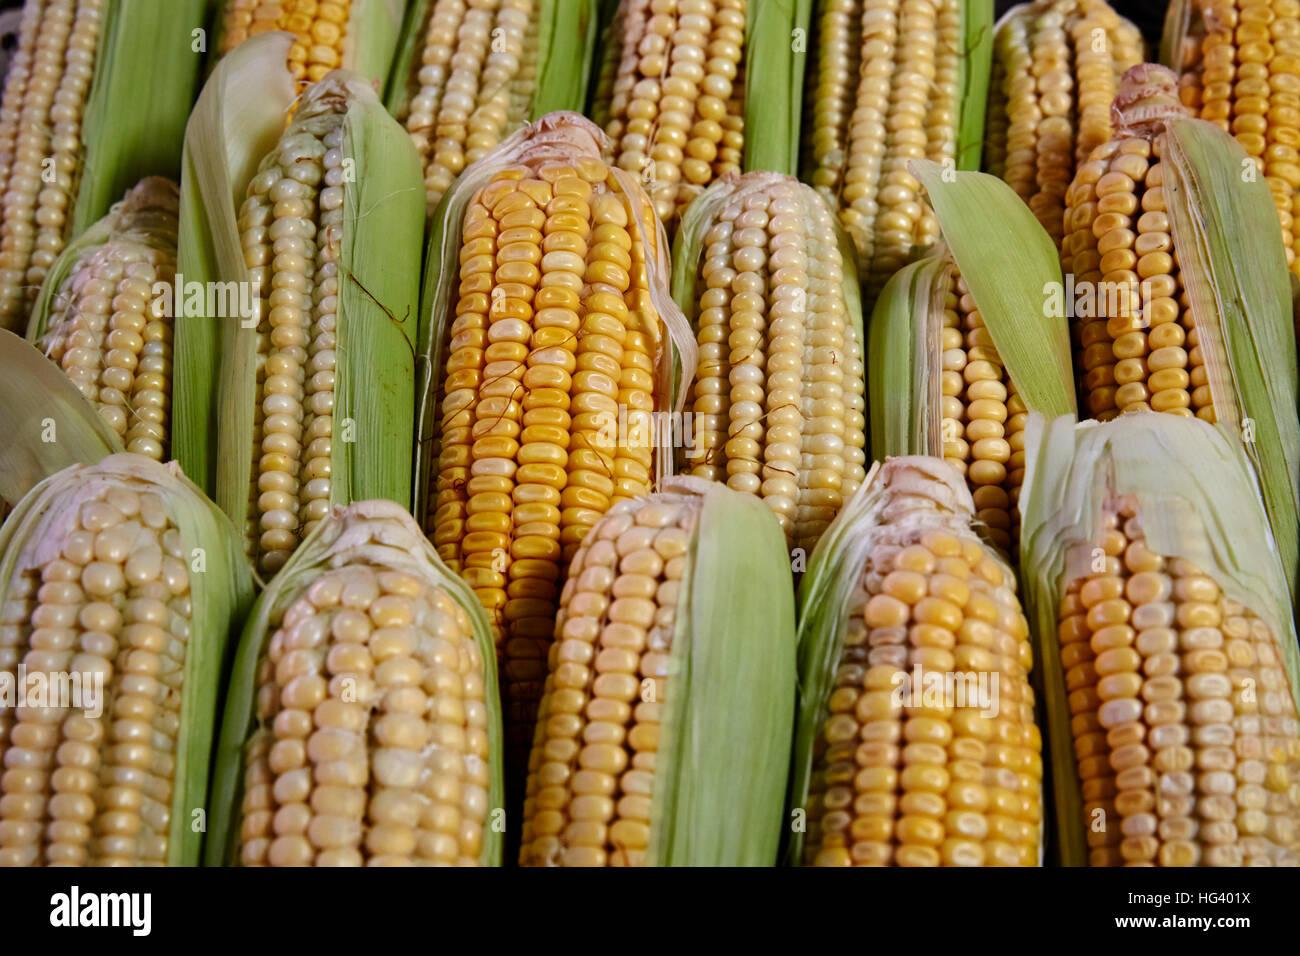 Flacq Market, Mauritius. Market Stall. Close up of fresh produce. - Stock Image